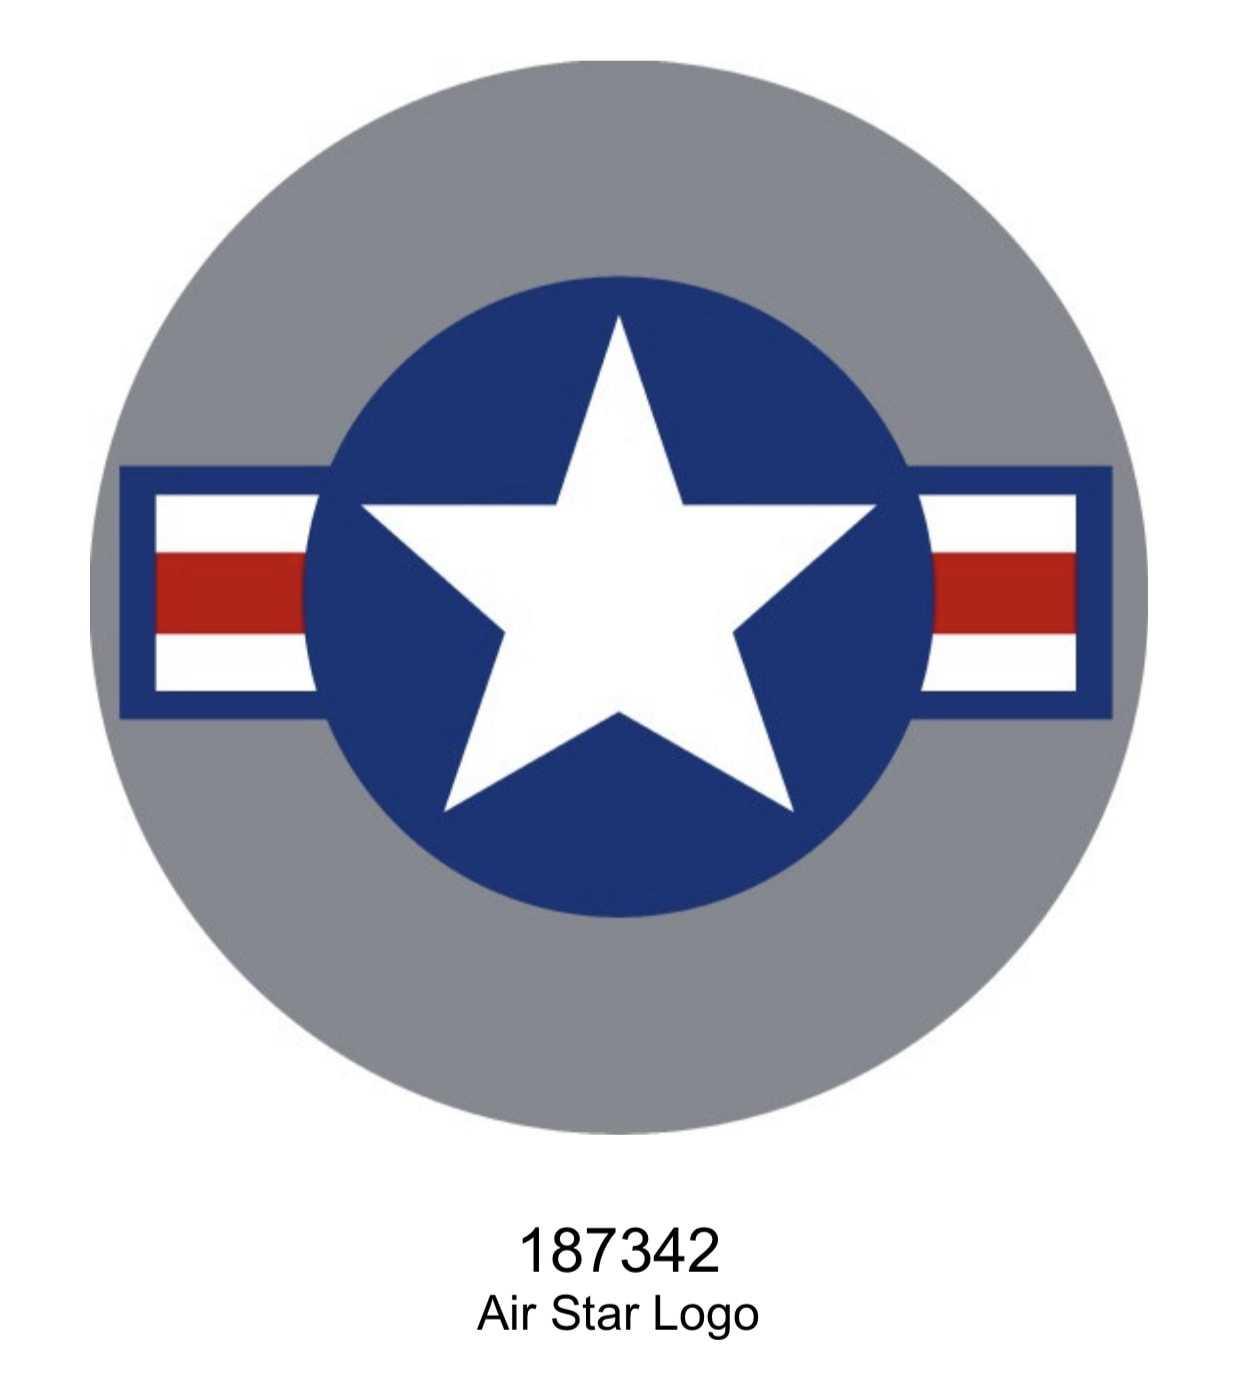 Air Star Logo Dome Metal Sign